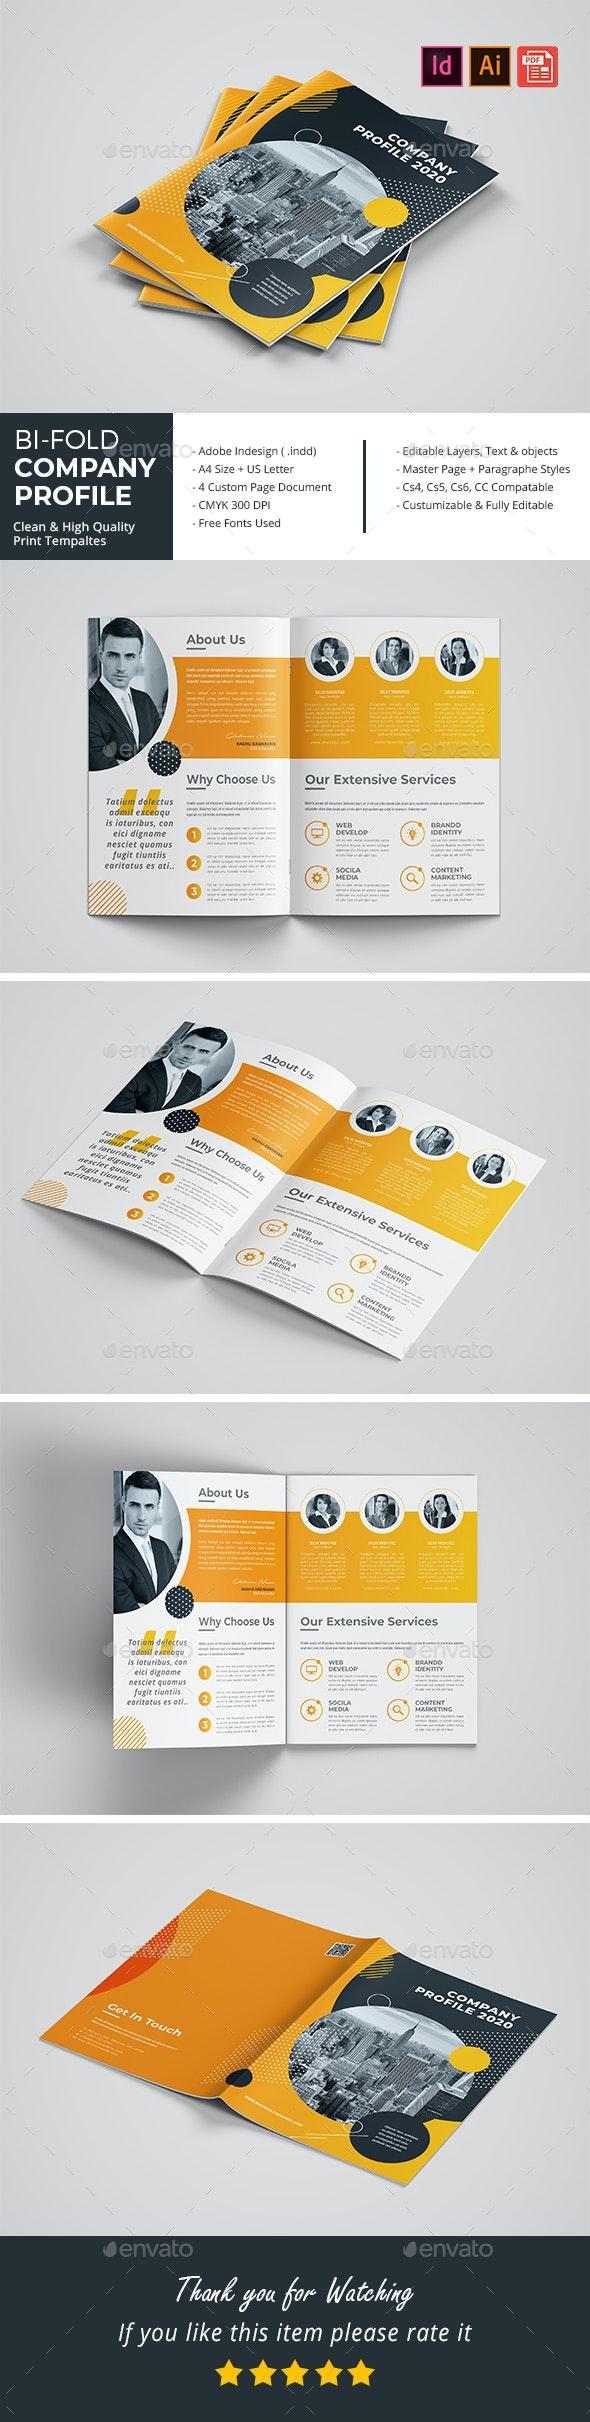 Bifold Company Profile 2020 - Corporate Brochures